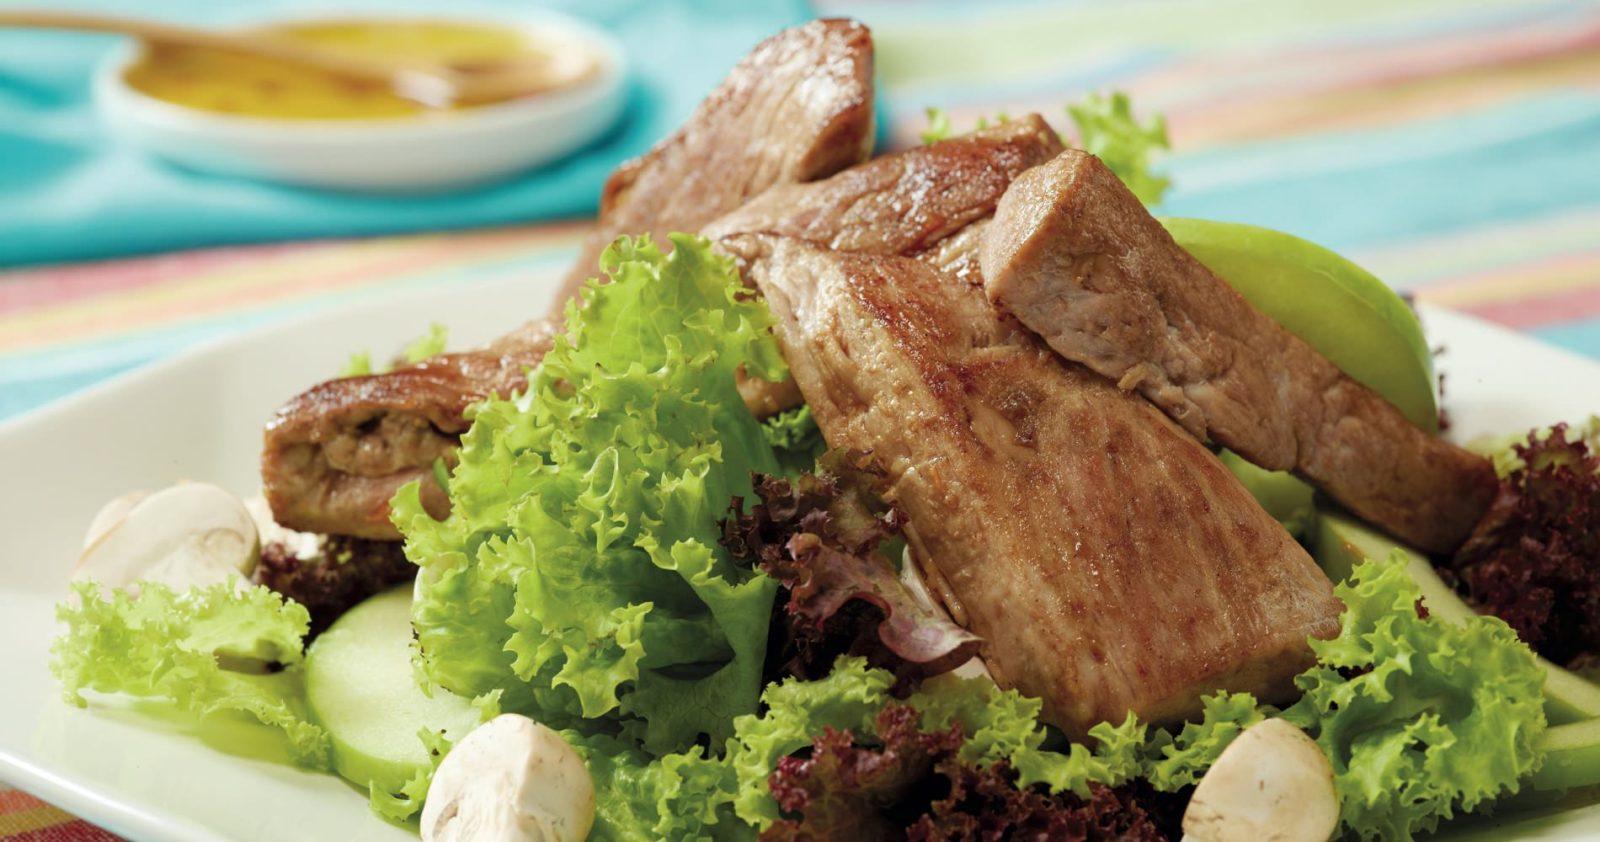 Solomito De Cerdo Con Ensalada Fresca